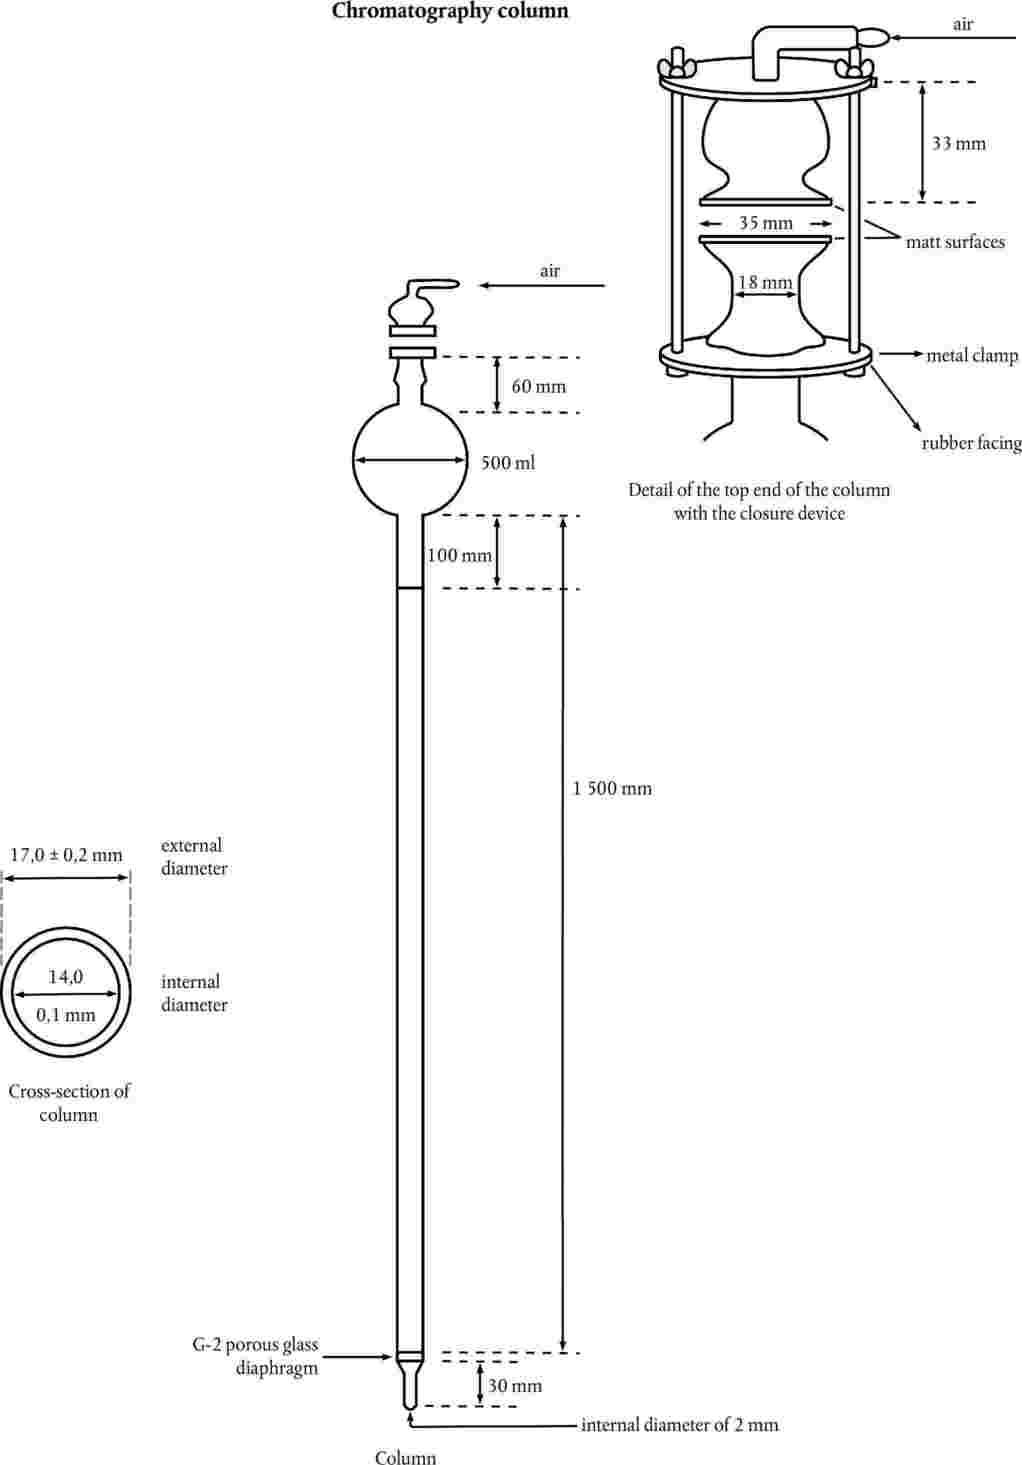 Eur Lex 52008xc053007 En Mercury Trim Relay Wiring Image